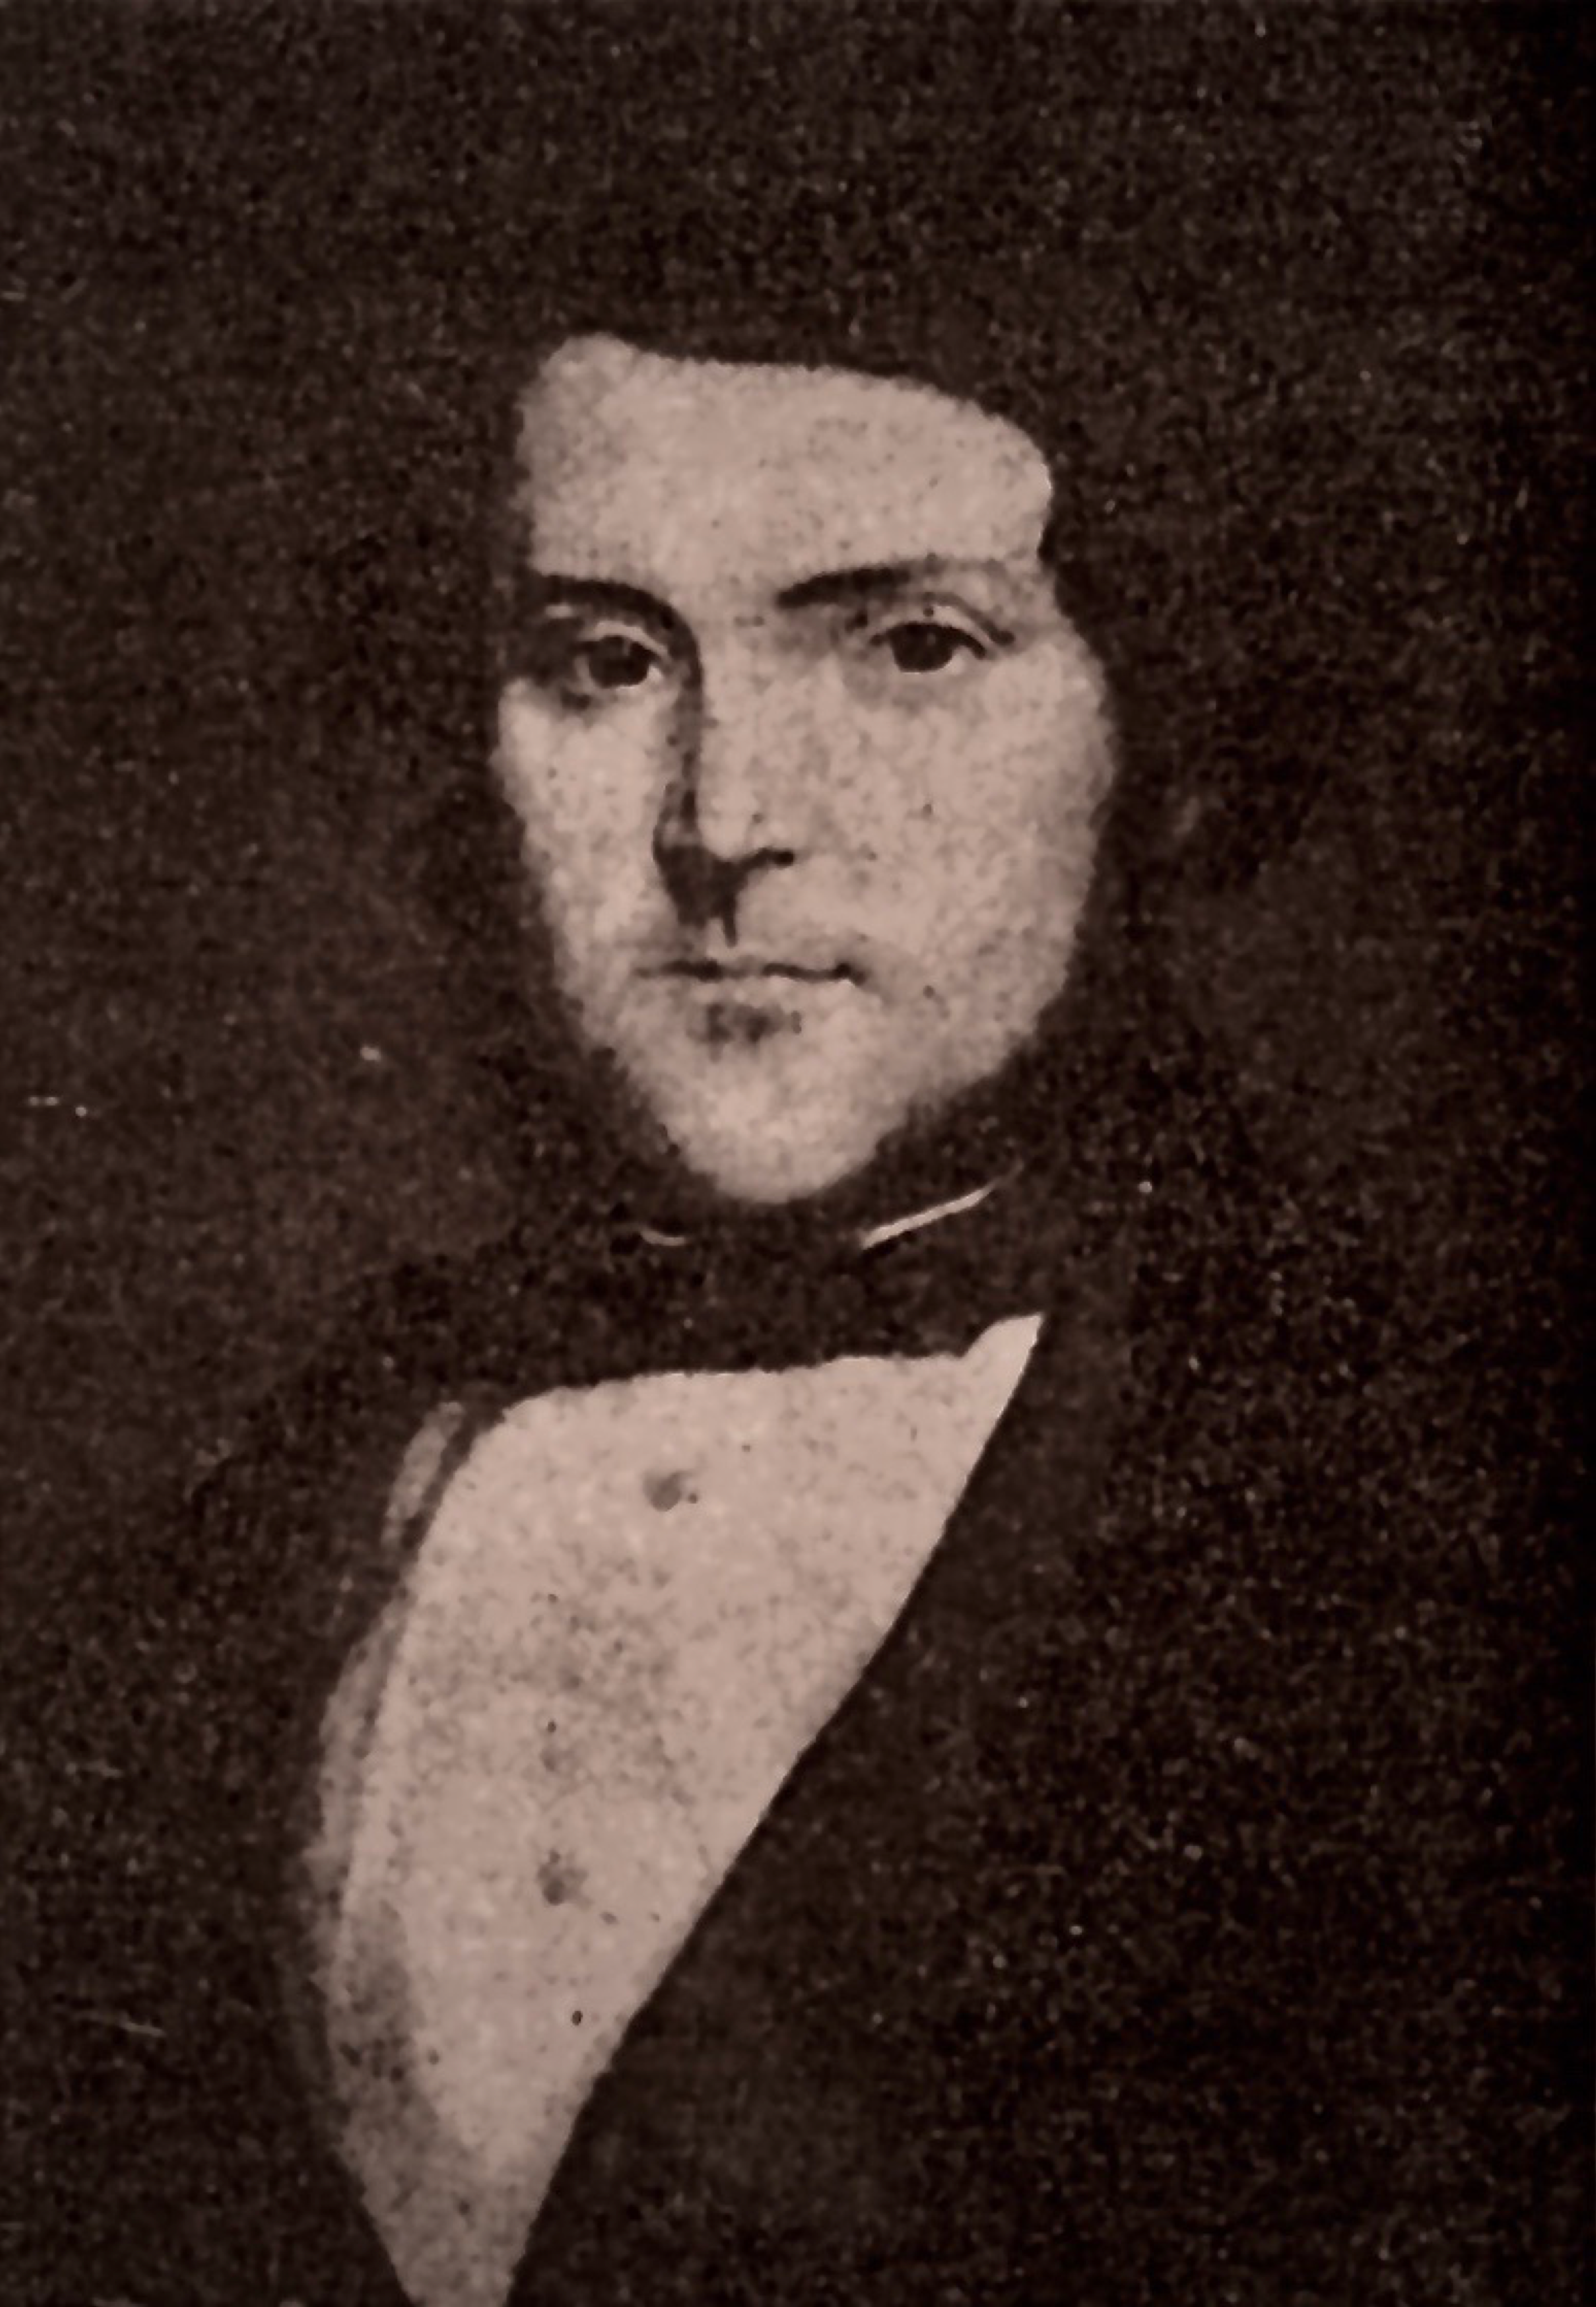 John Isaac Williams - portrait